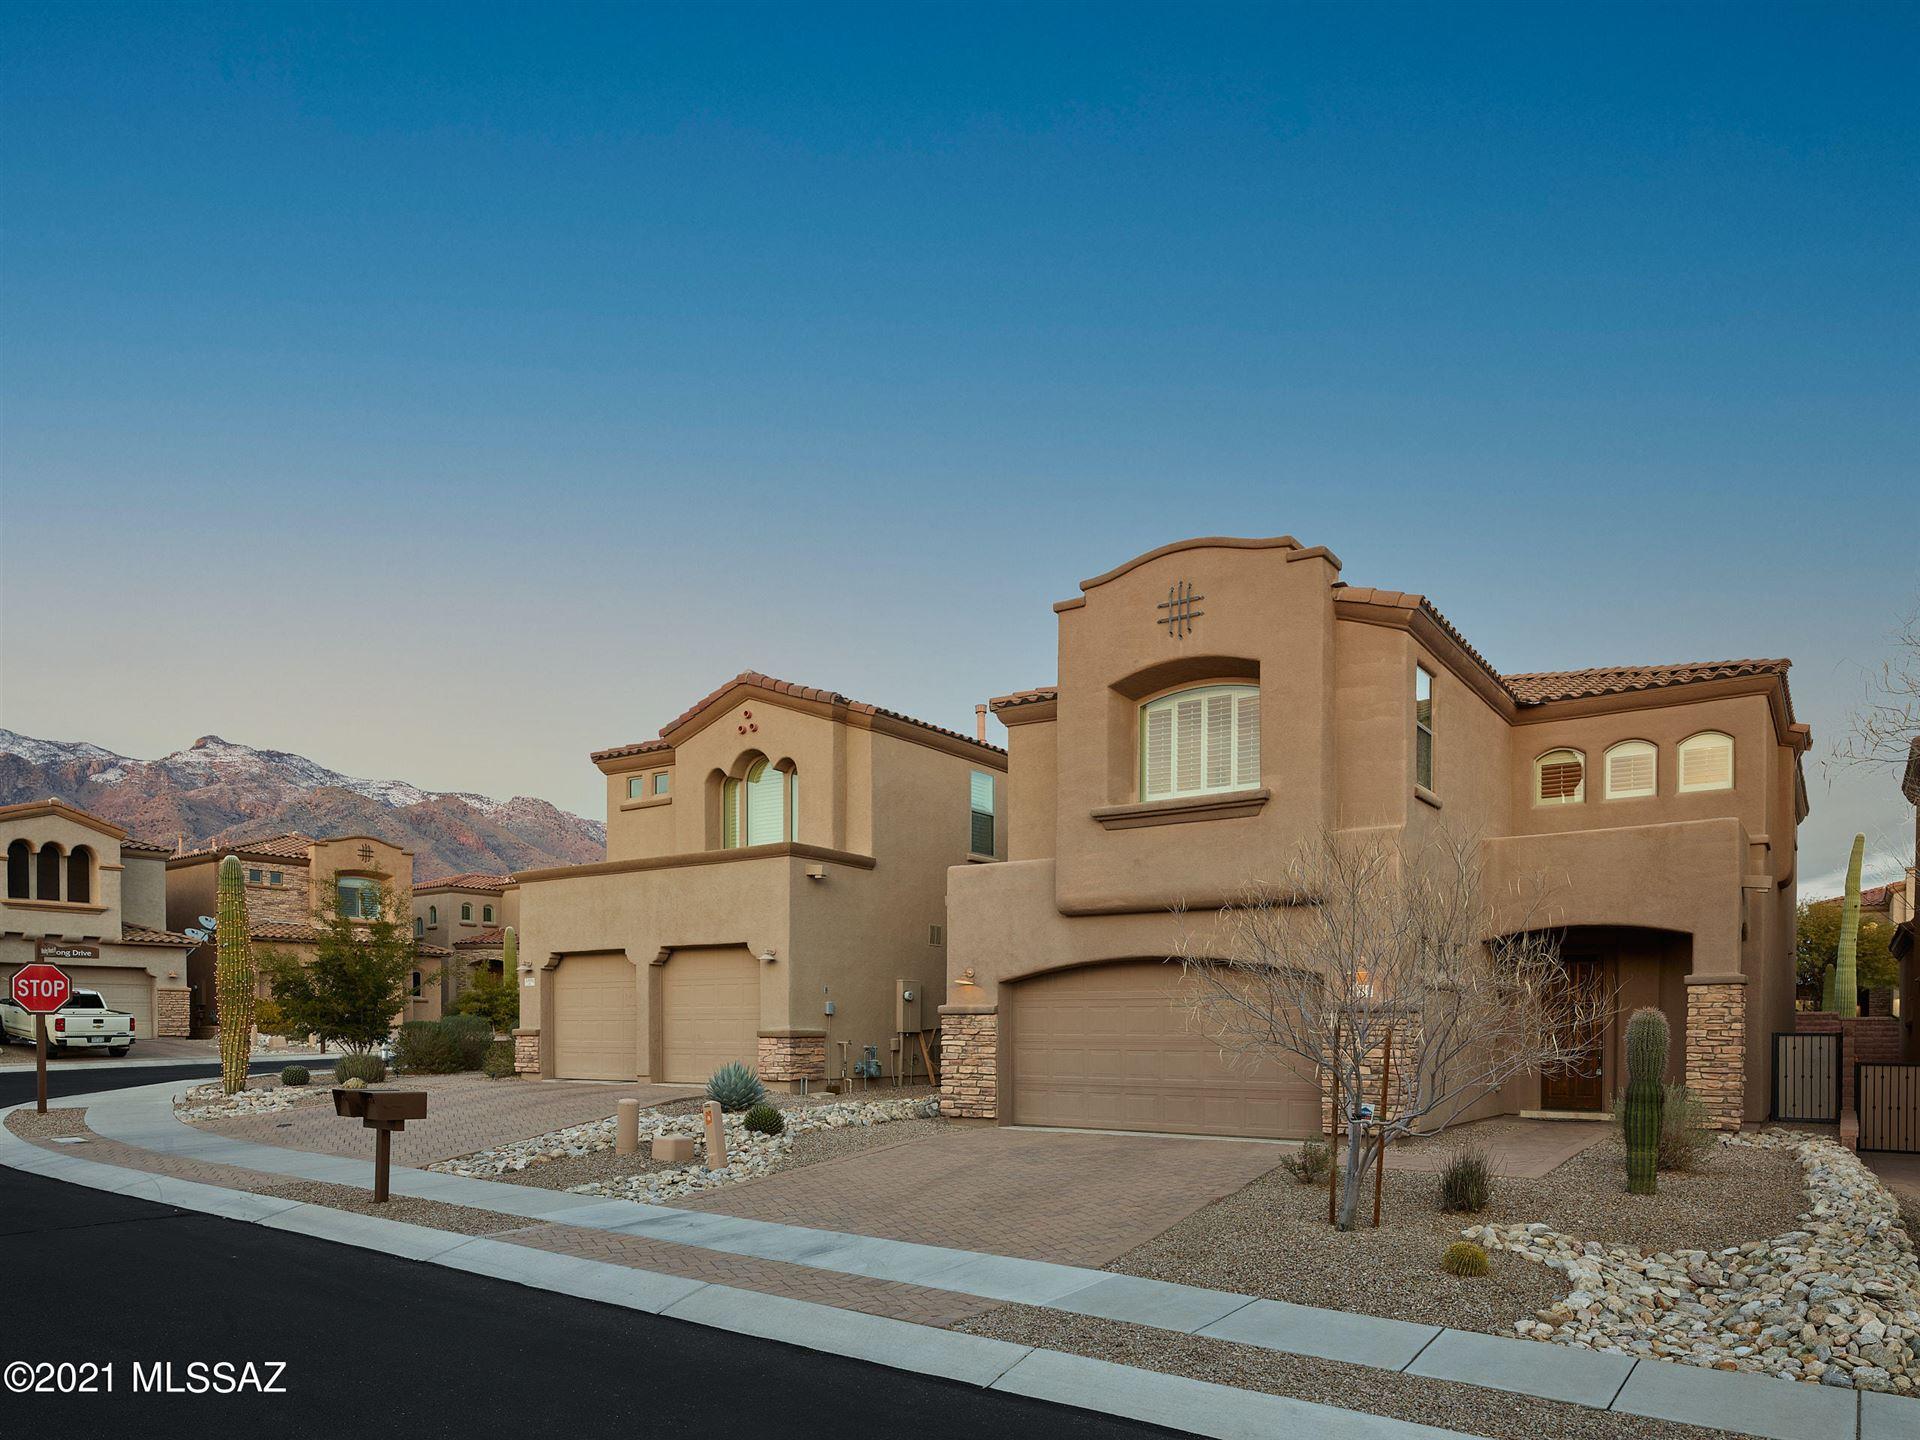 5796 N Winding Woods Place, Tucson, AZ 85718 - MLS#: 22111160